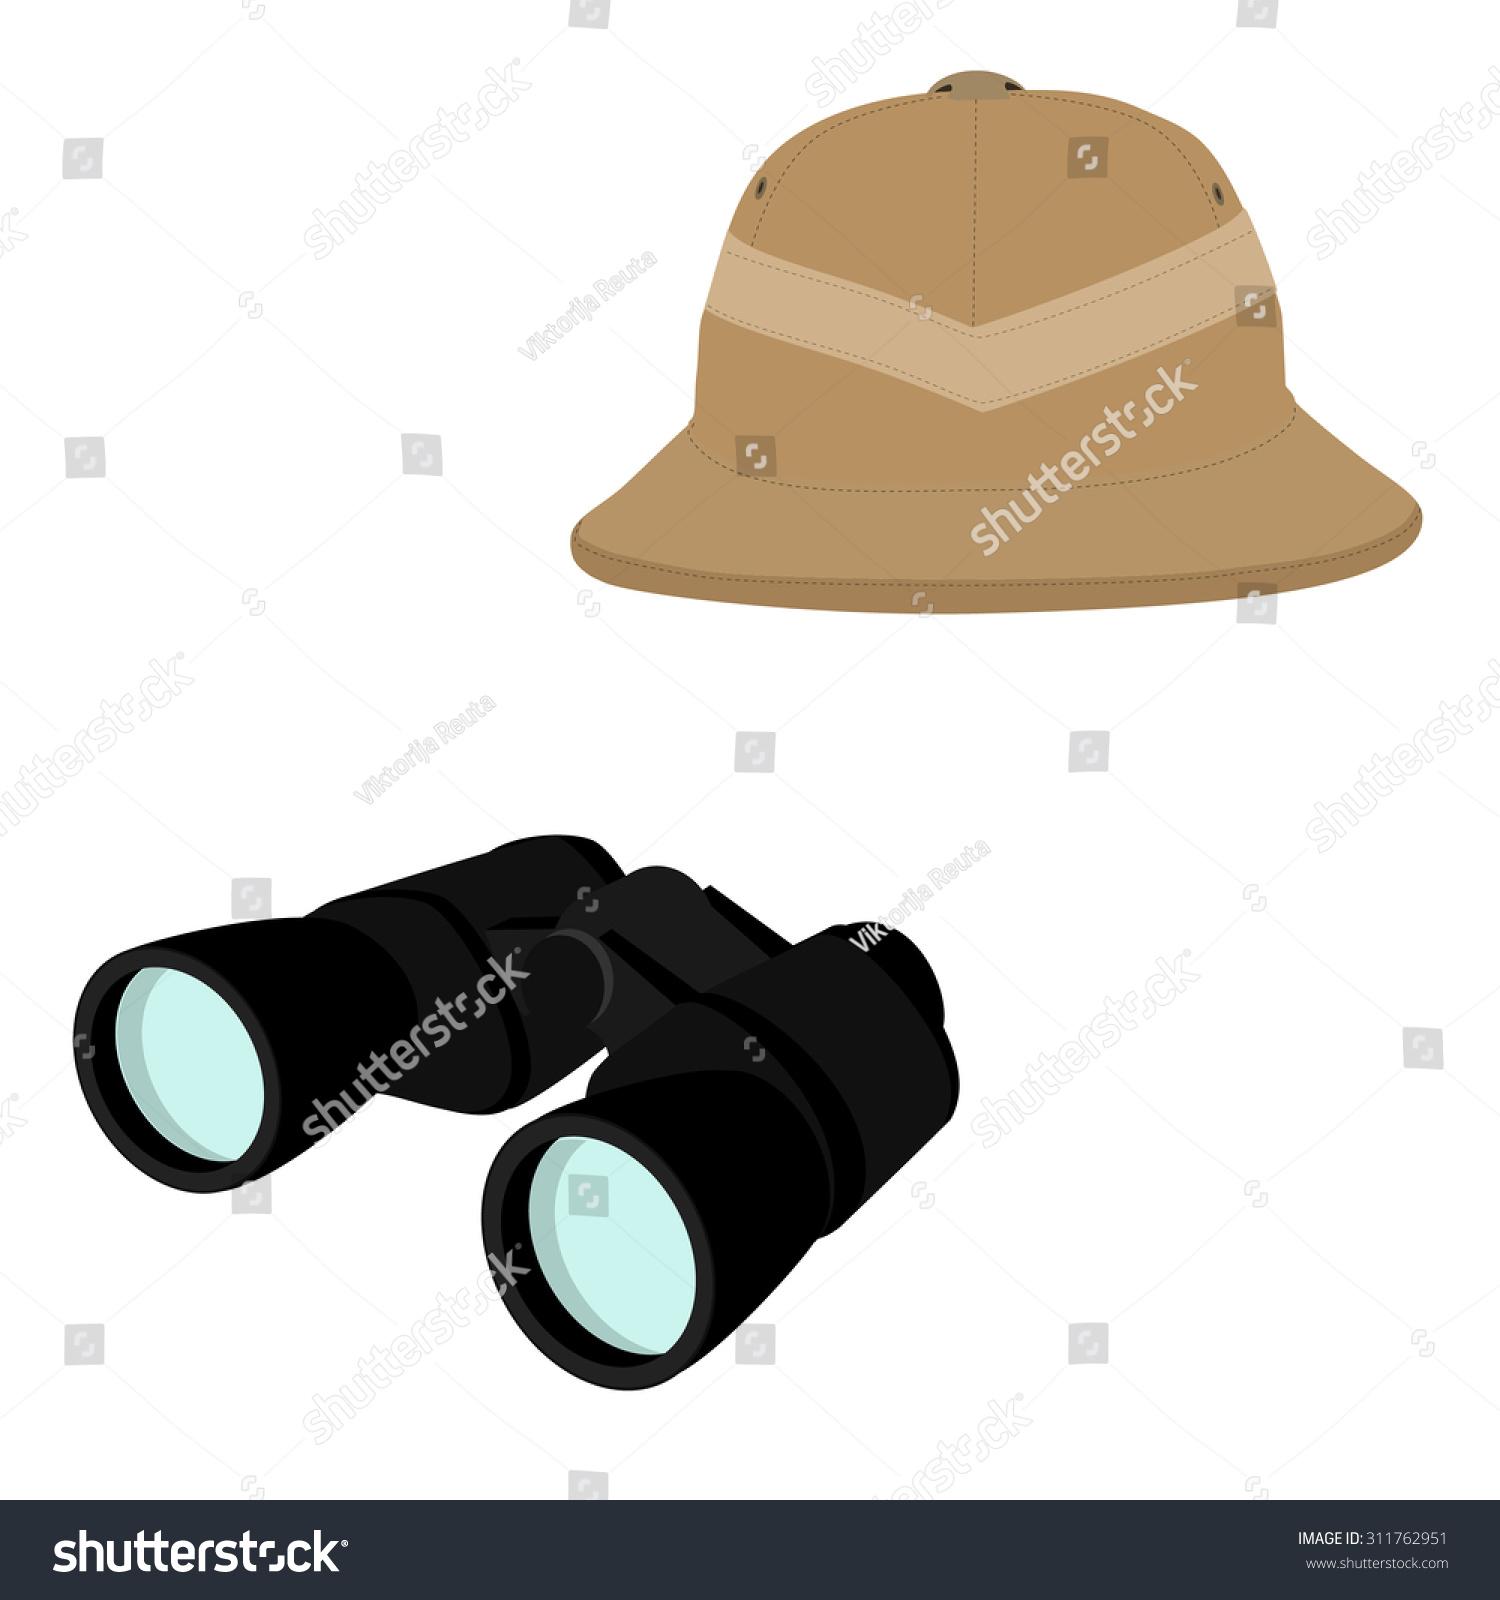 Vector illustration of safari hat and black binoculars. Safari concept.  Traveling icons pith helmet bb38170de6f